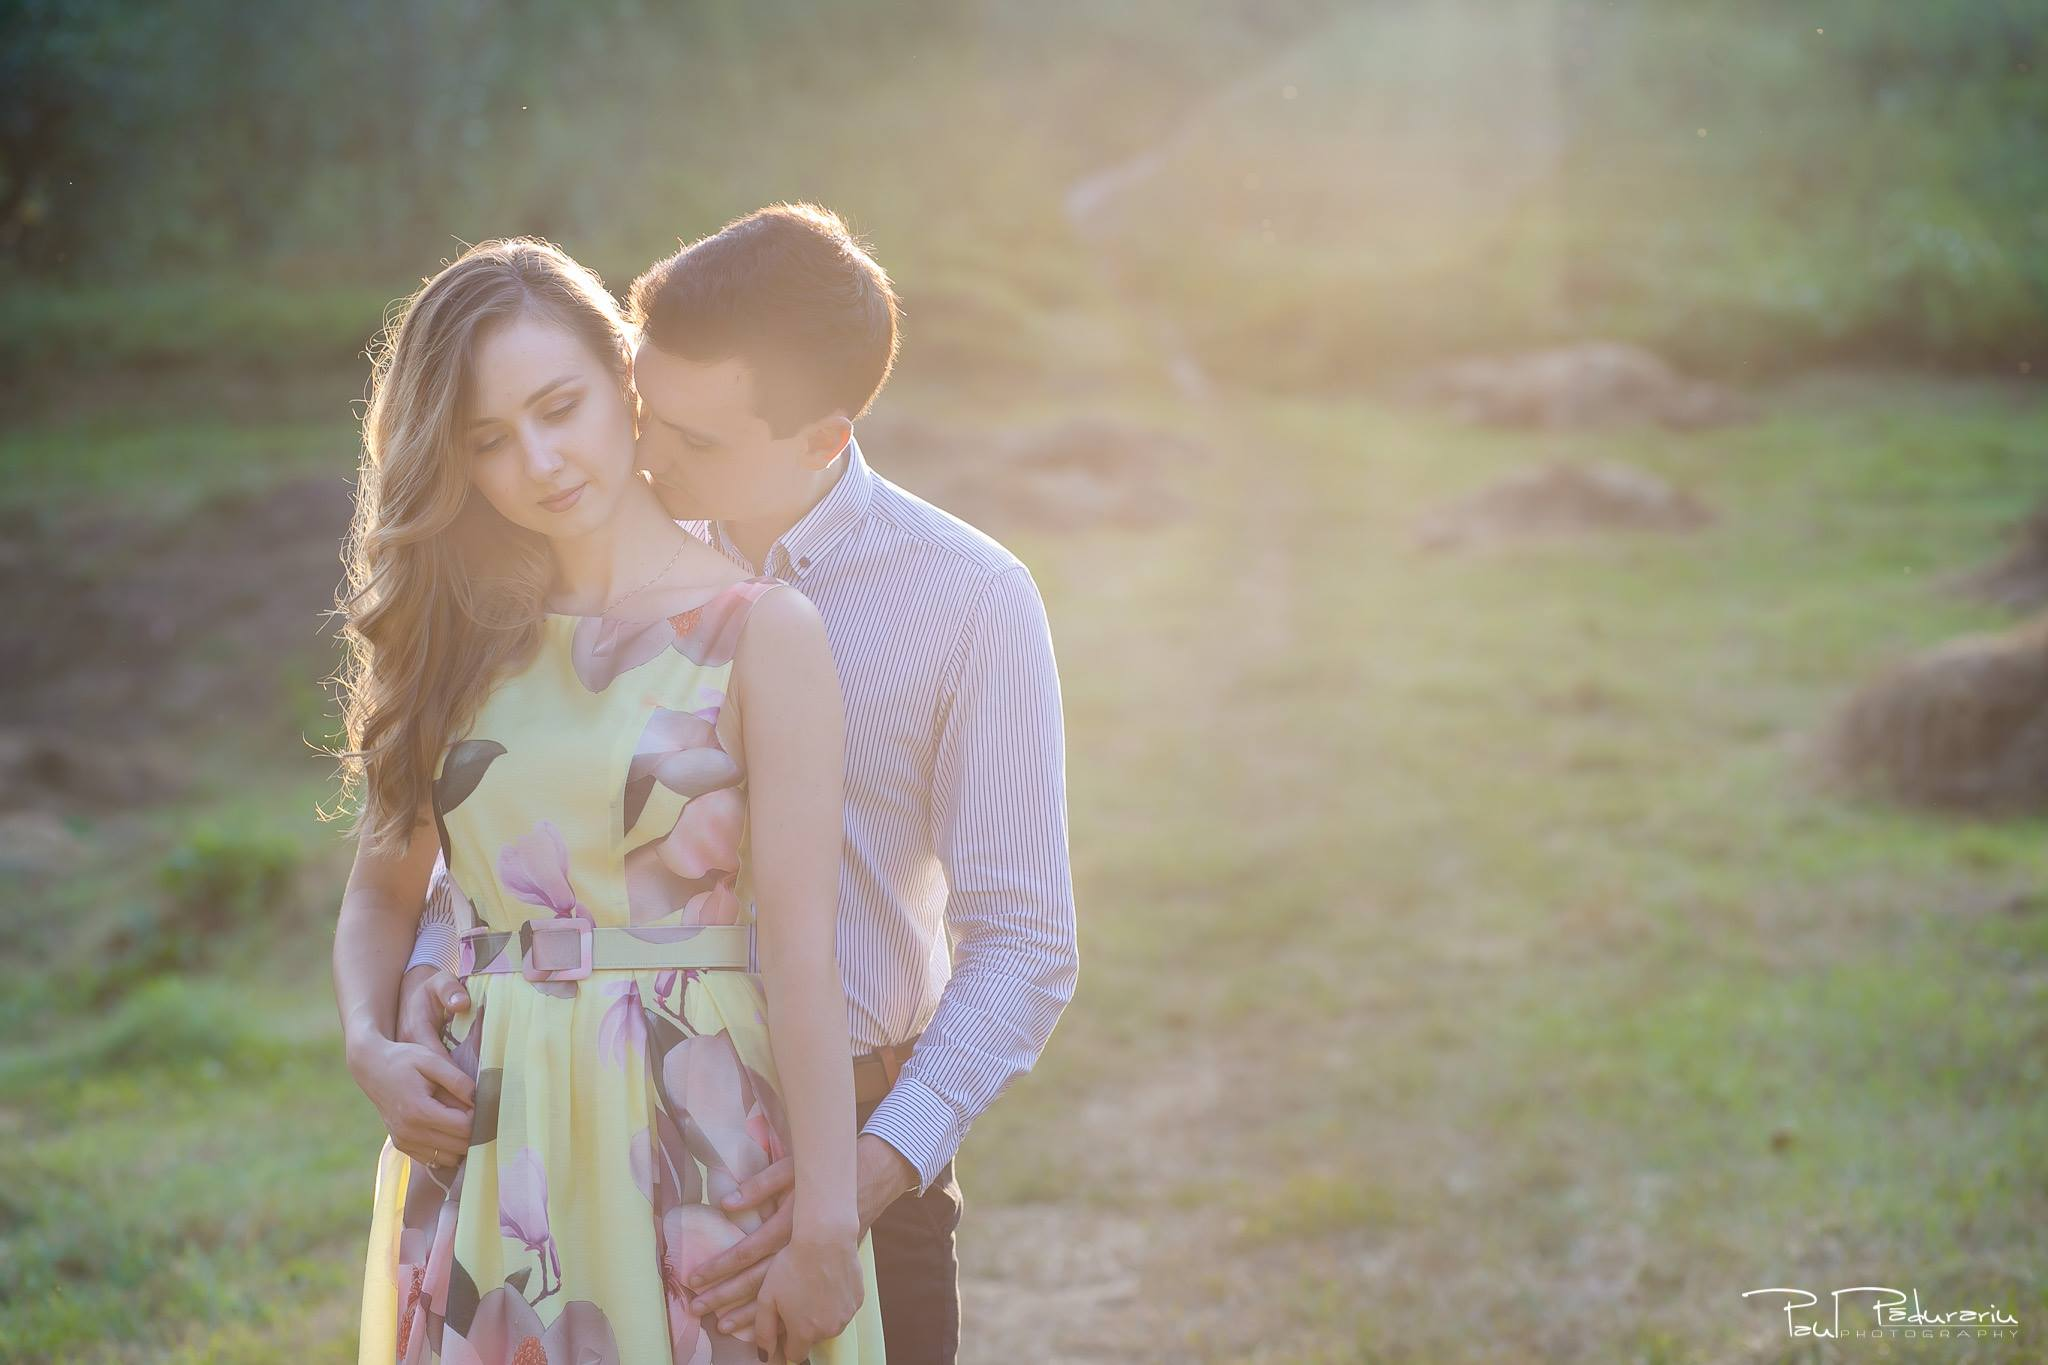 Nicoleta si Catalin - sedinta foto de logodna in Gradina Botanica Iasi - www.paulpadurariu.ro - fotograf profesionist de nunta Iasi